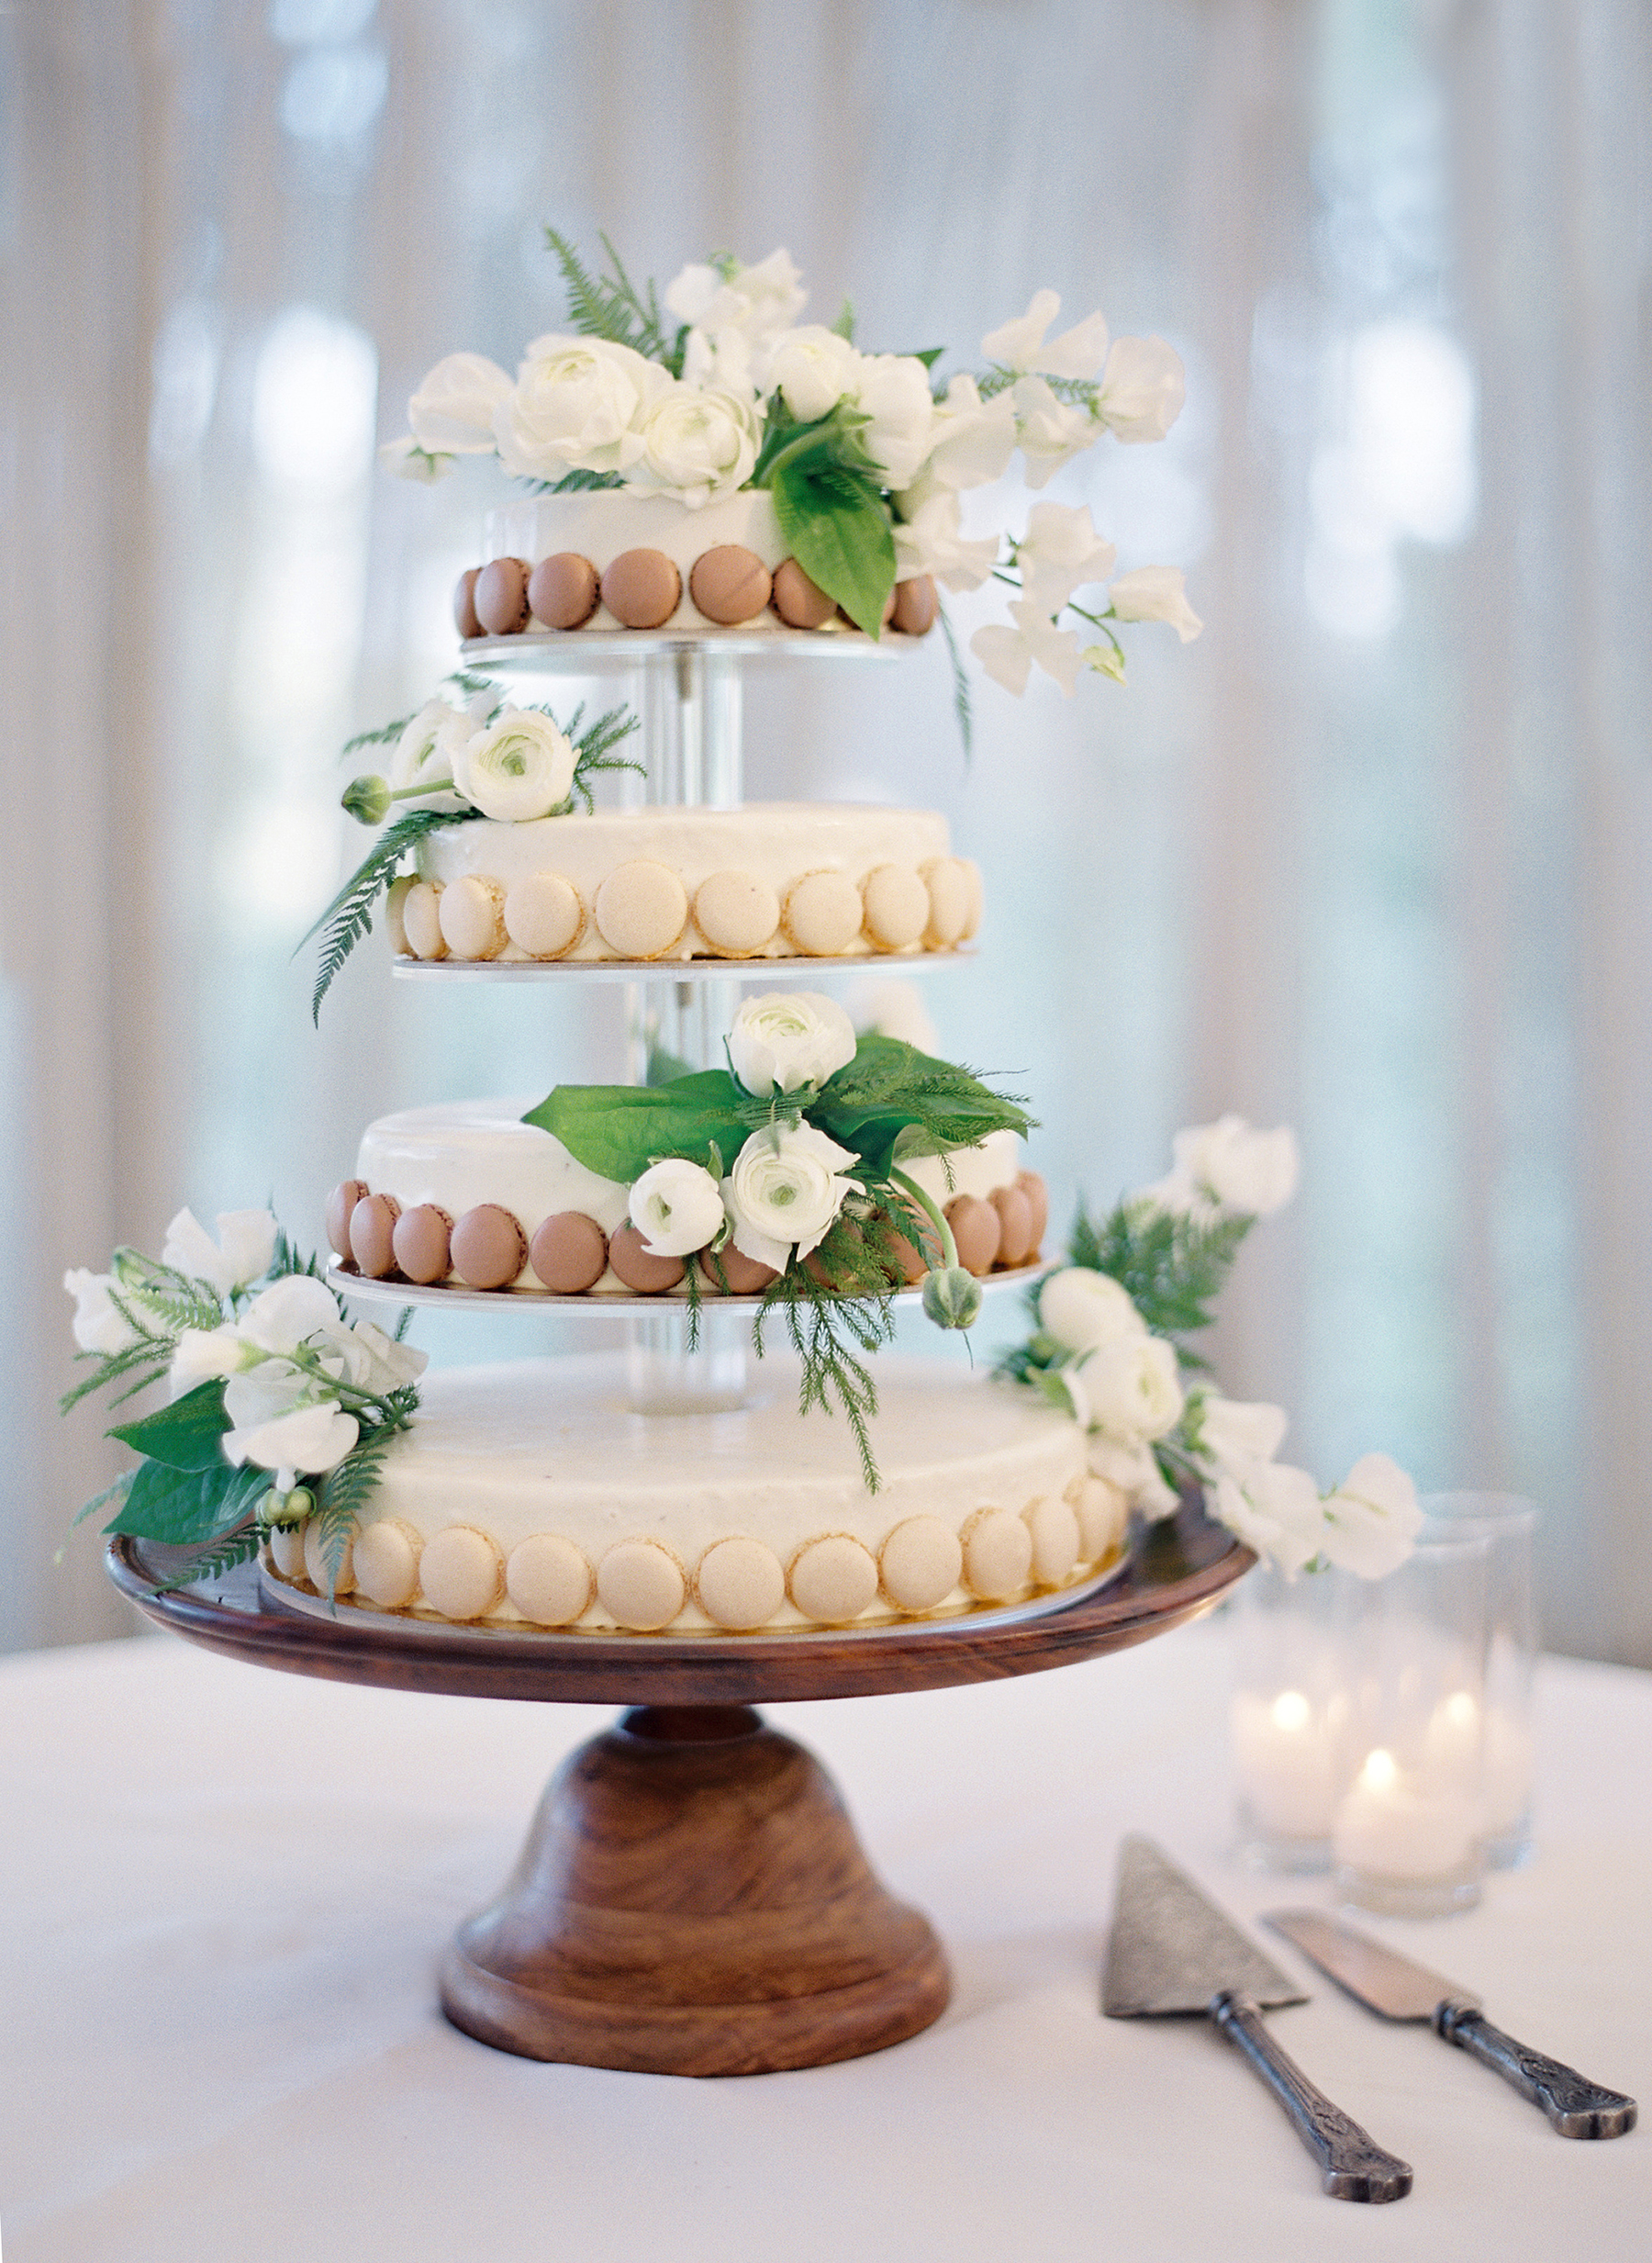 tiered cake with macaron border